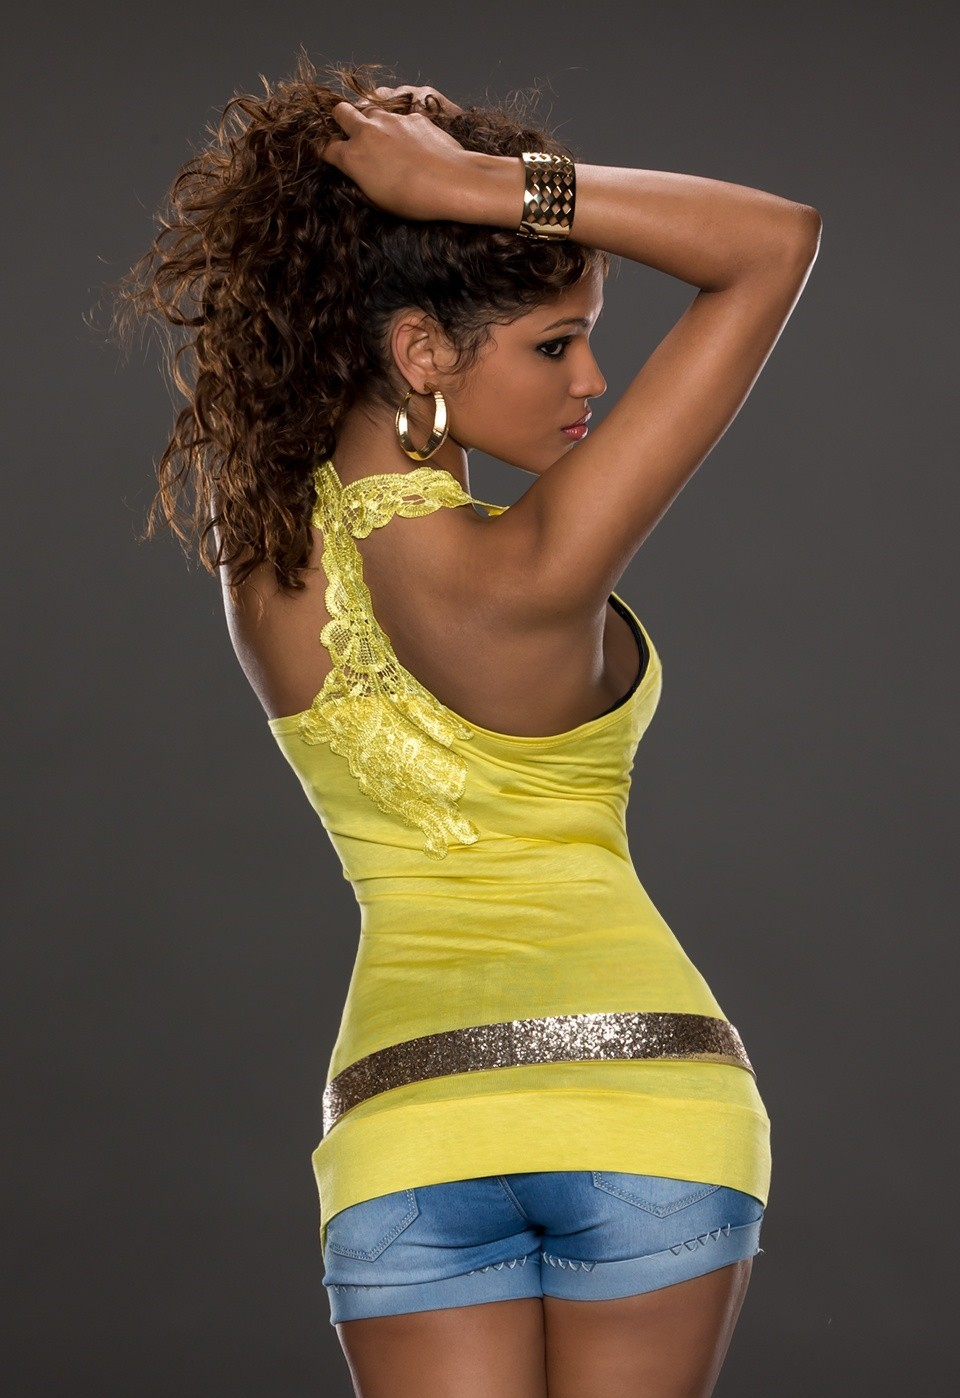 Sexy dámský top - žlutý (Dámský top)